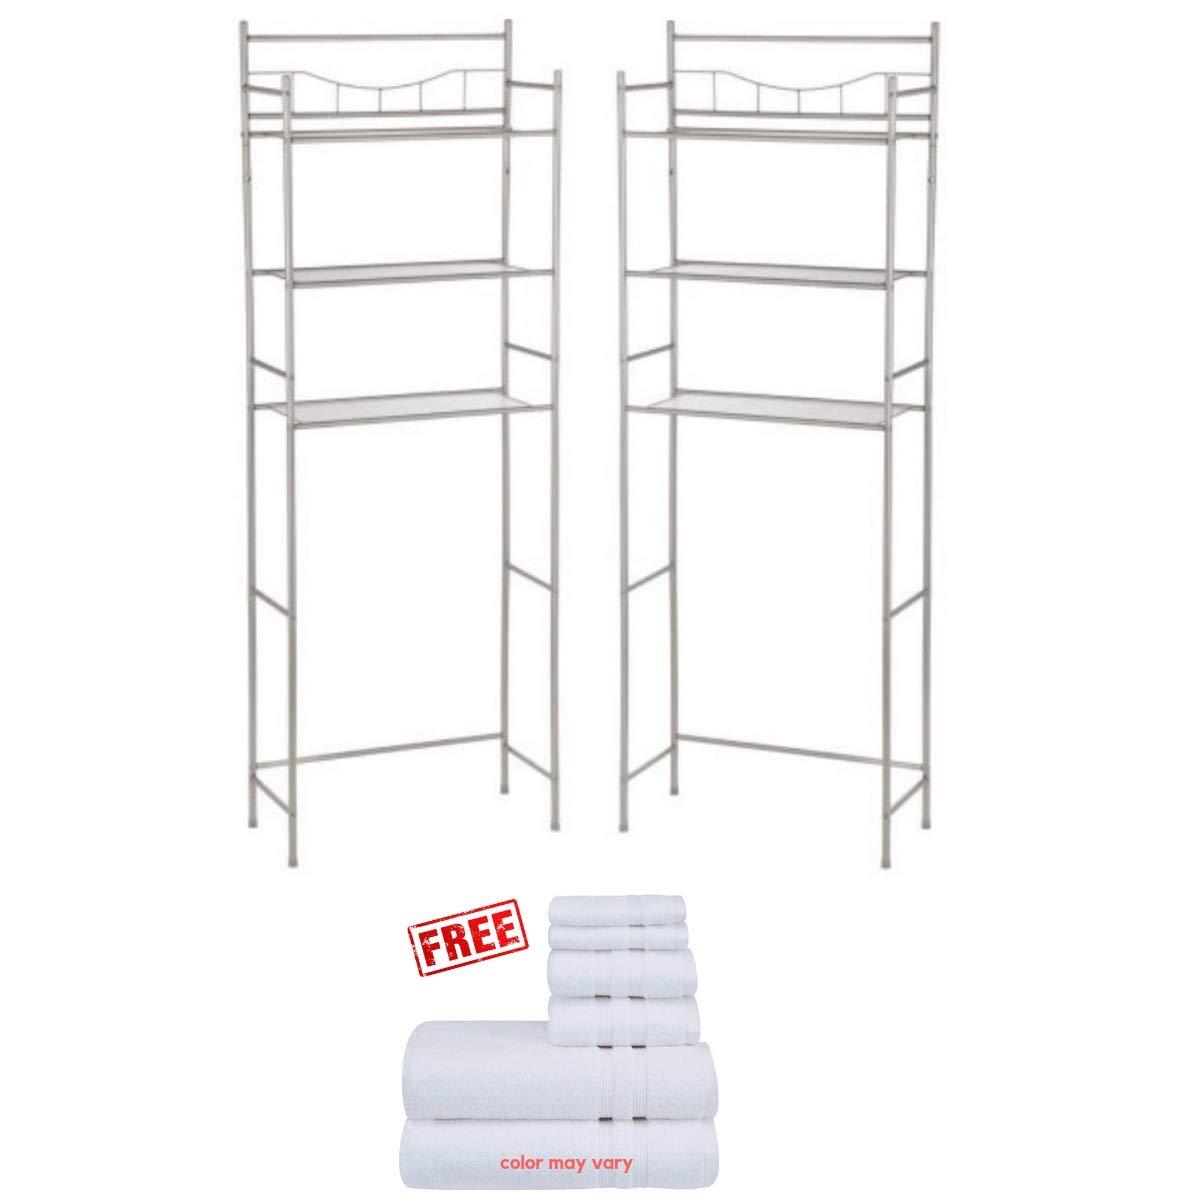 Satin Nickel 3-Shelf Bathroom Space Saver Storage Organizer Over The Rack Toilet Cabinet Shelving Towel Rack Mainstay.